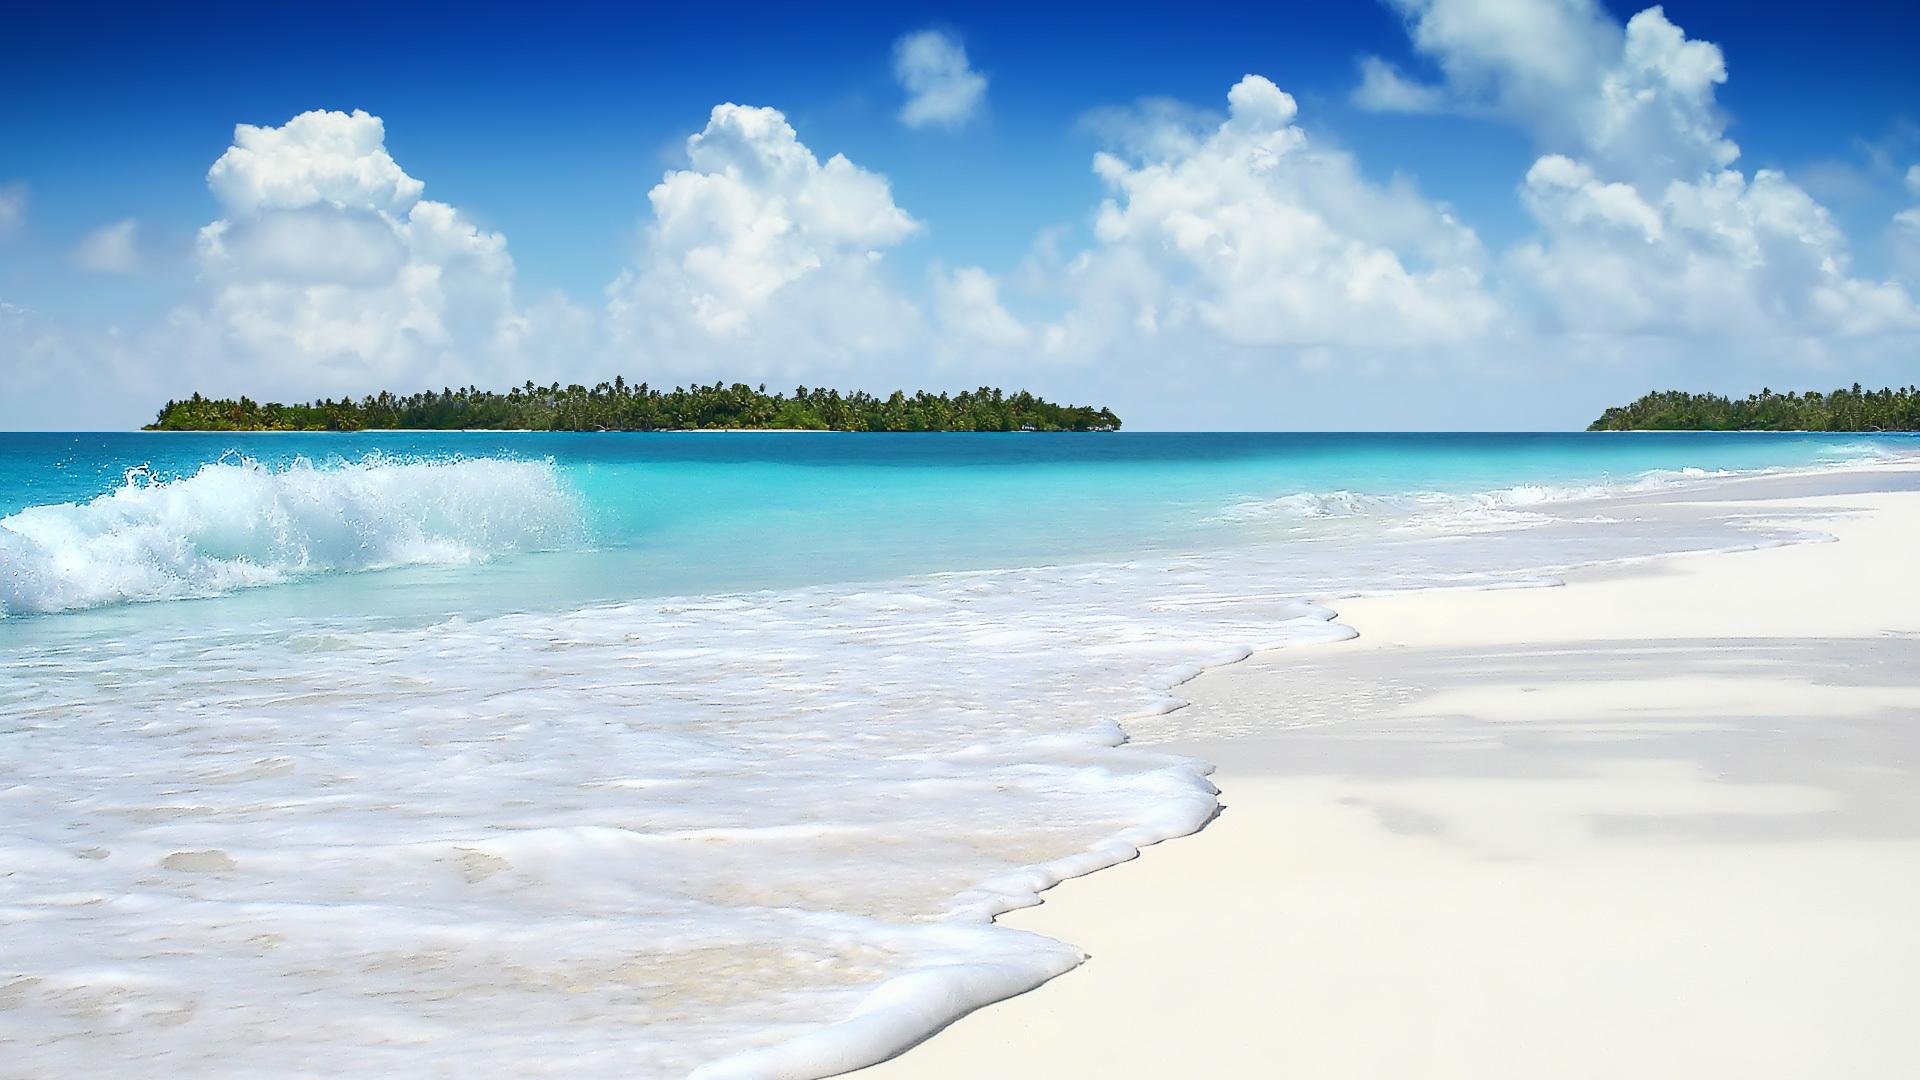 maldives wallpaper widescreen hd